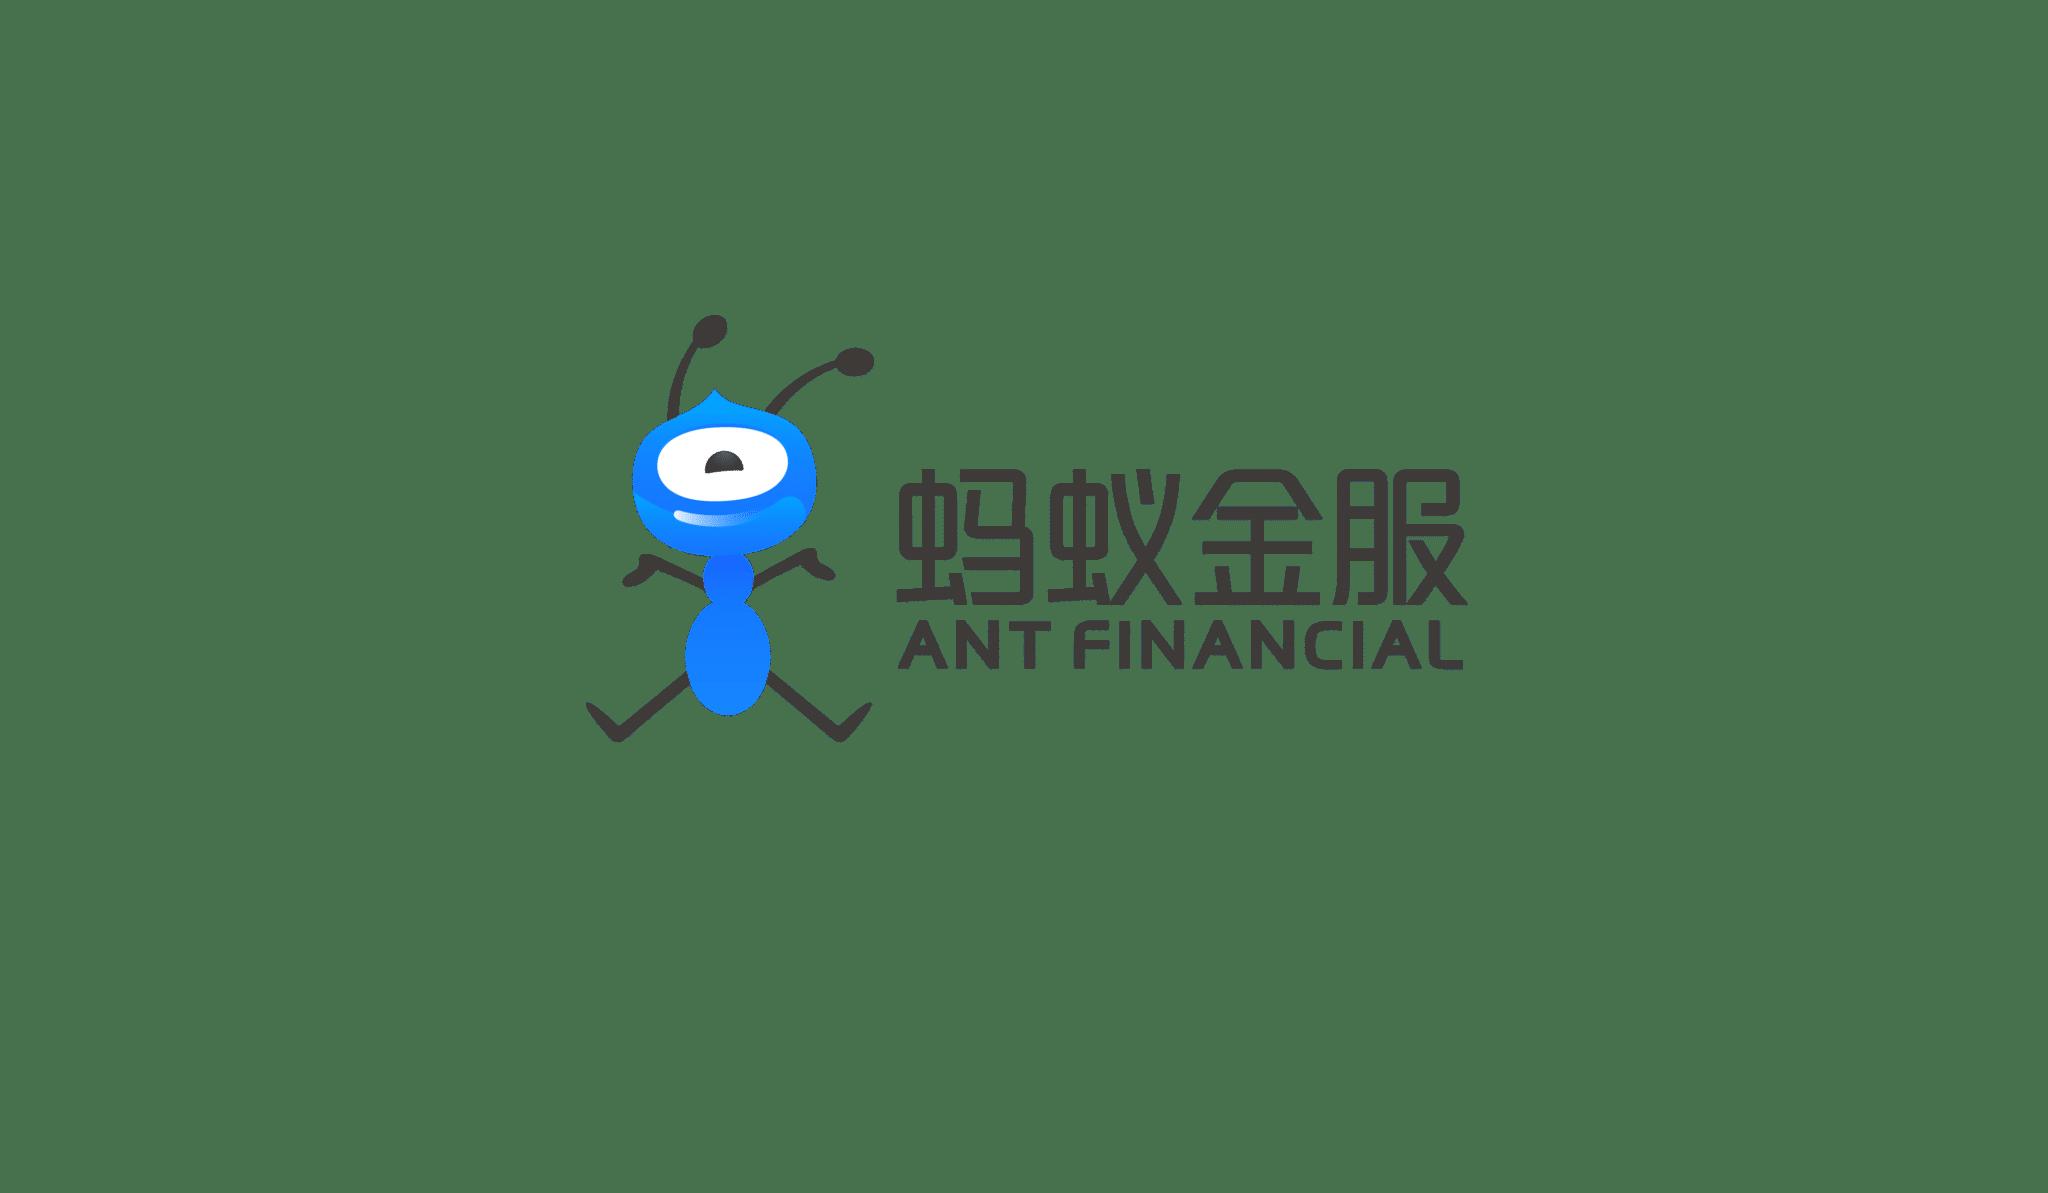 Ant Financial Intelligent Platform Logo